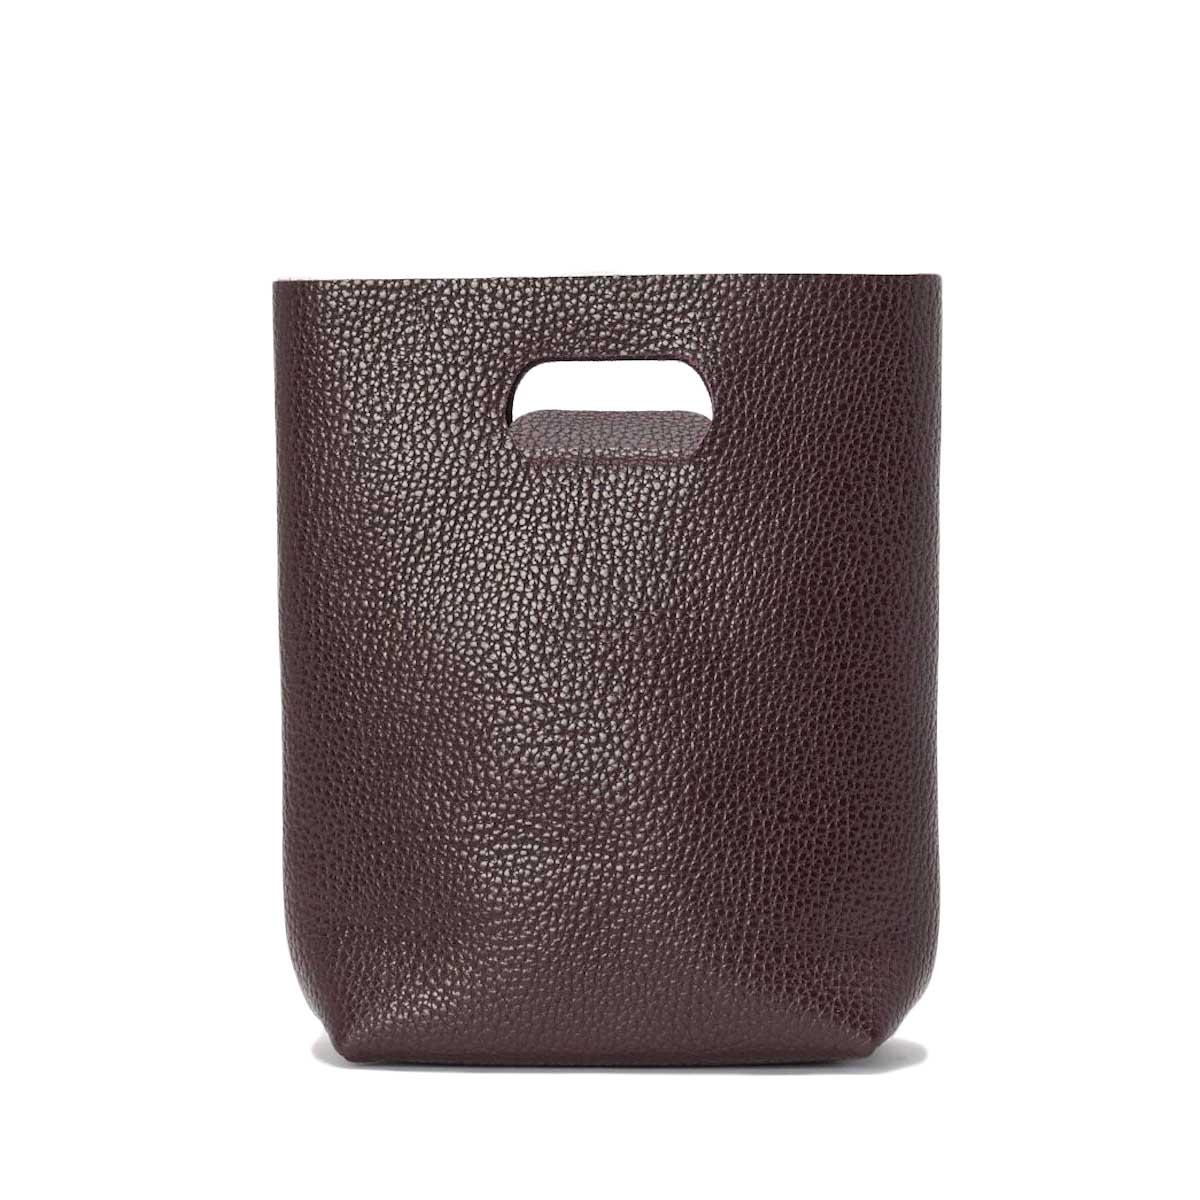 Hender Scheme / not eco bag small (Burgundy)